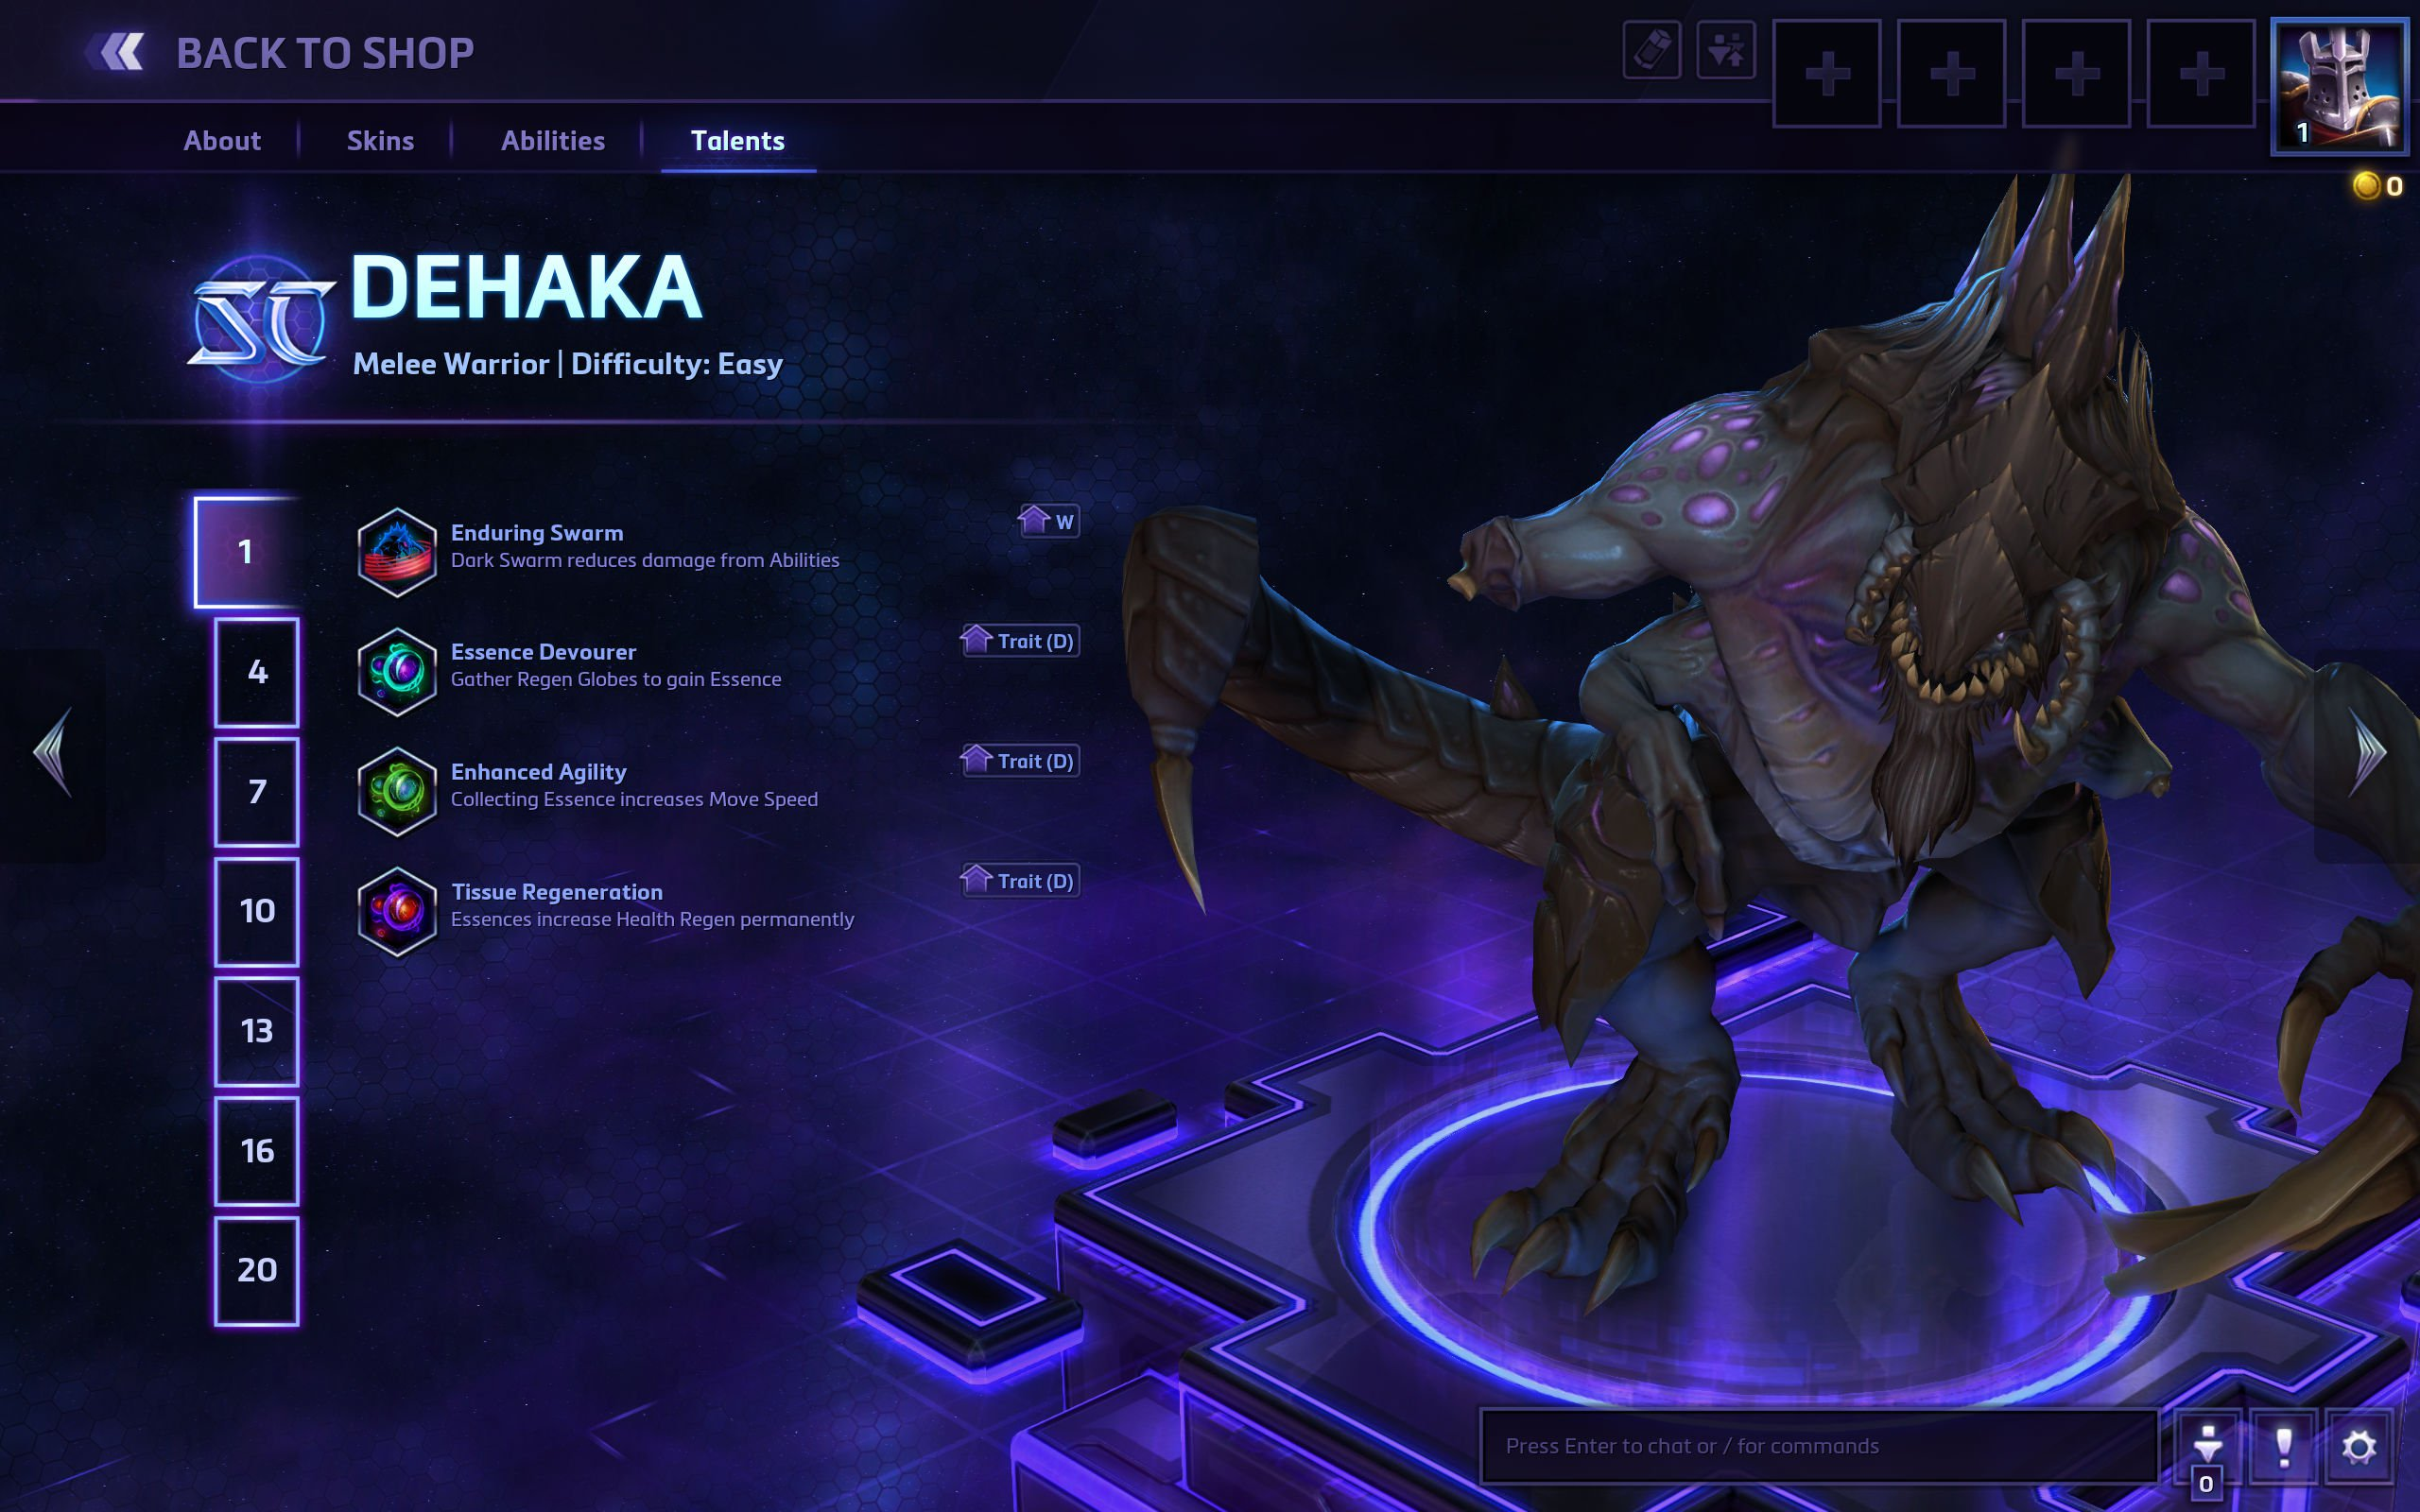 Dehaka Held Heroes of the Storm 2